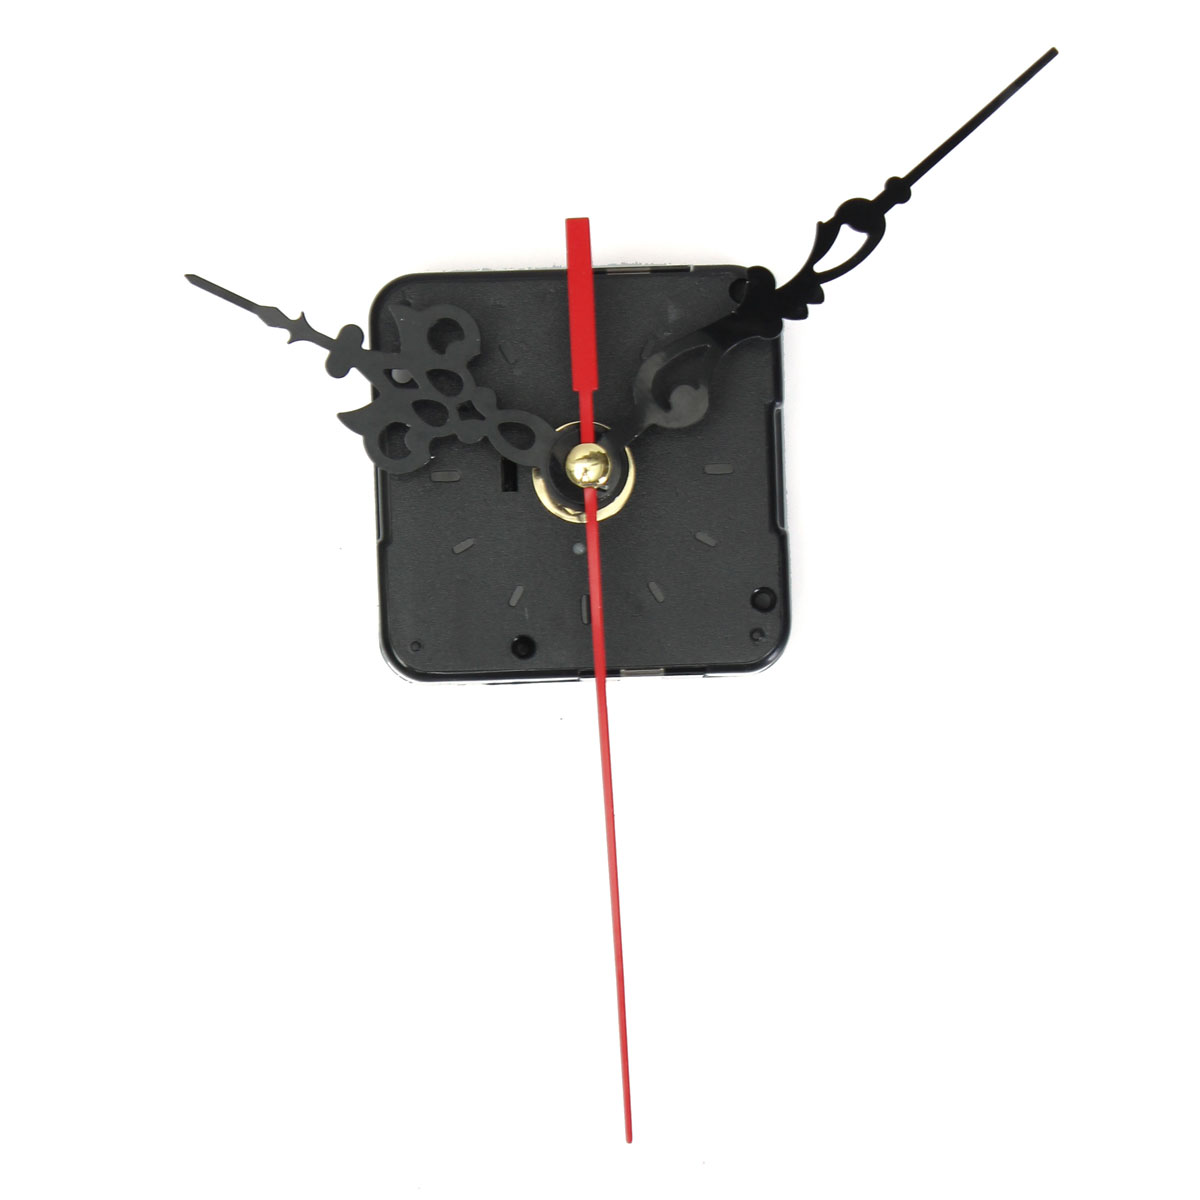 NEW High Quality Quartz Clock Movement Mechanism Module Repair DIY Kit Battery Powered With Hands(China (Mainland))